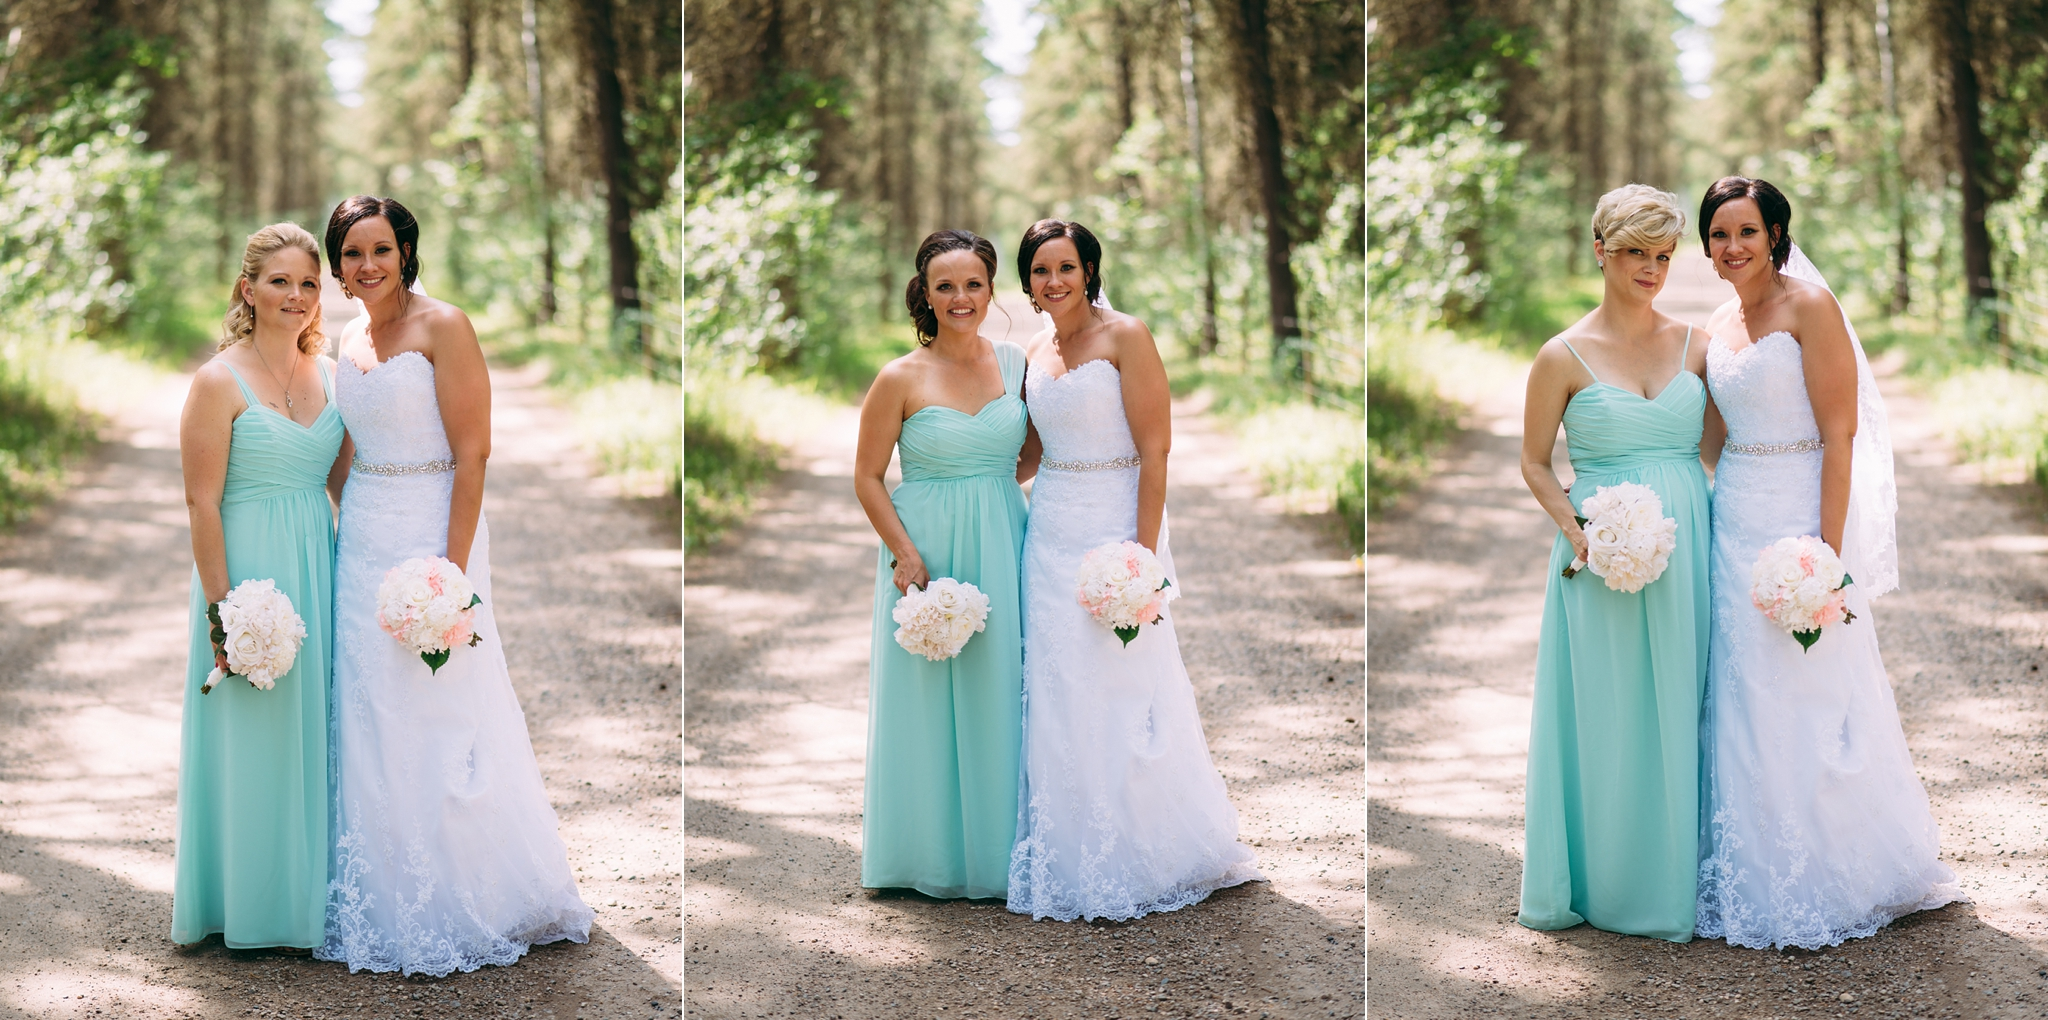 kaihla_tonai_intimate_wedding_elopement_photographer_1531